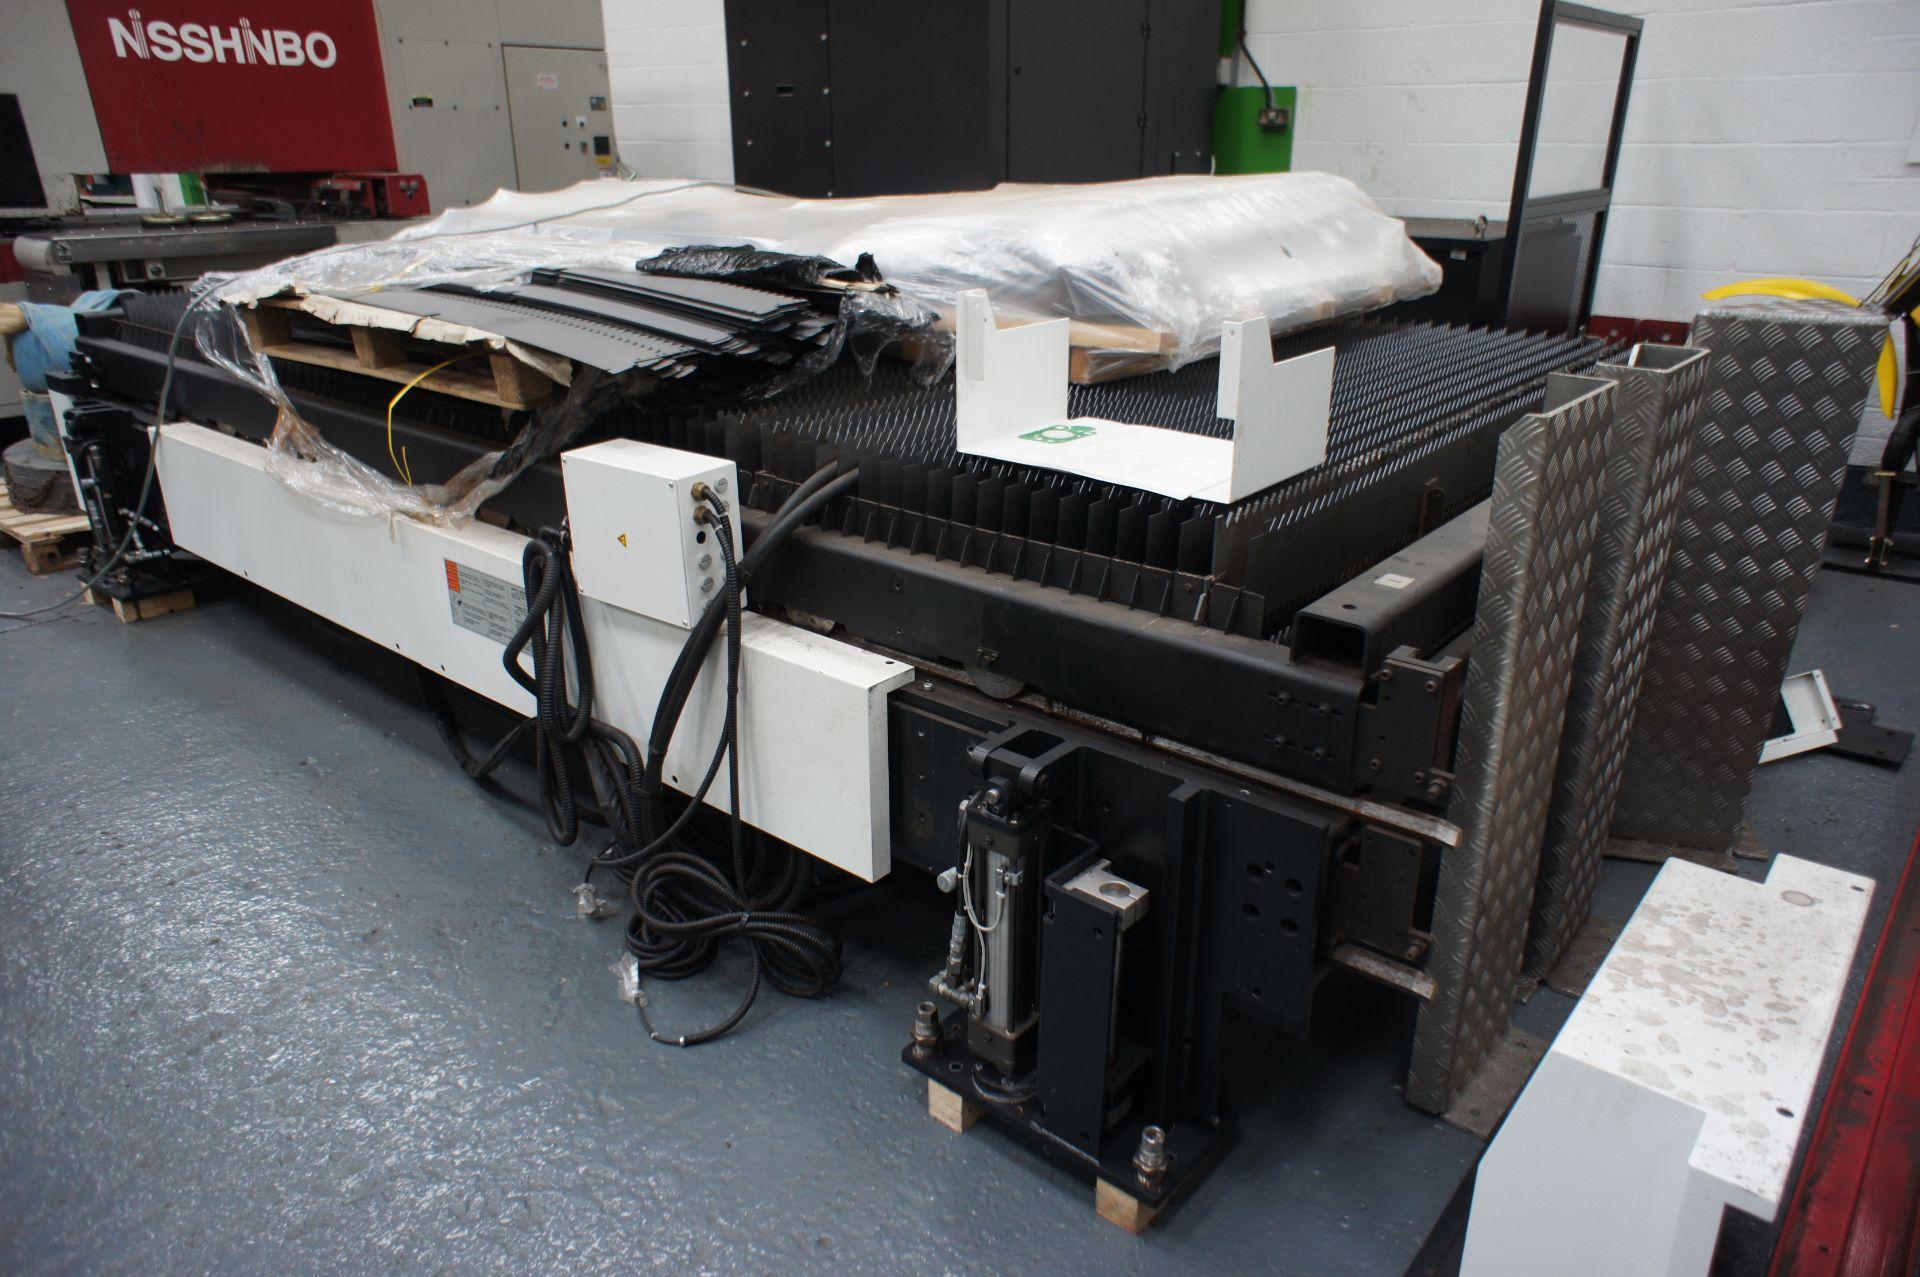 2015 - Mazak OptiPlex 4020 II Laser Cutting Machin - Image 11 of 15